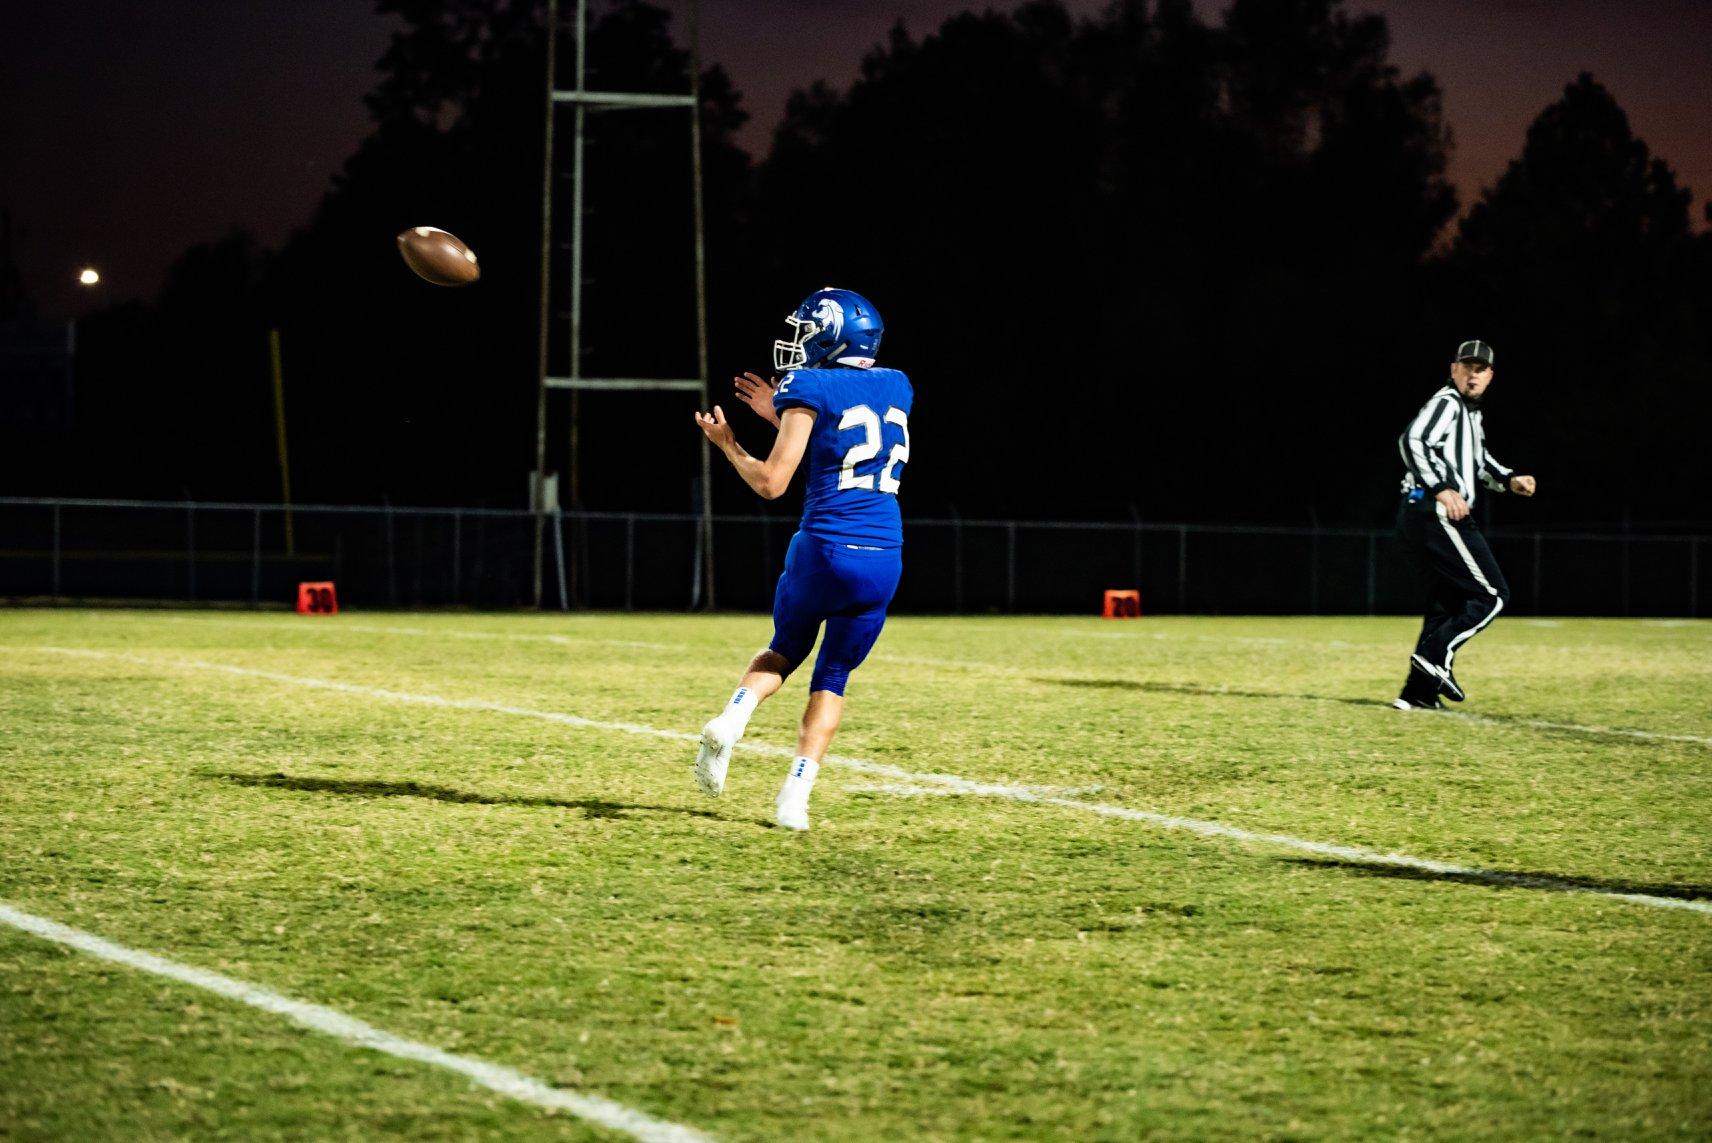 Blake catch